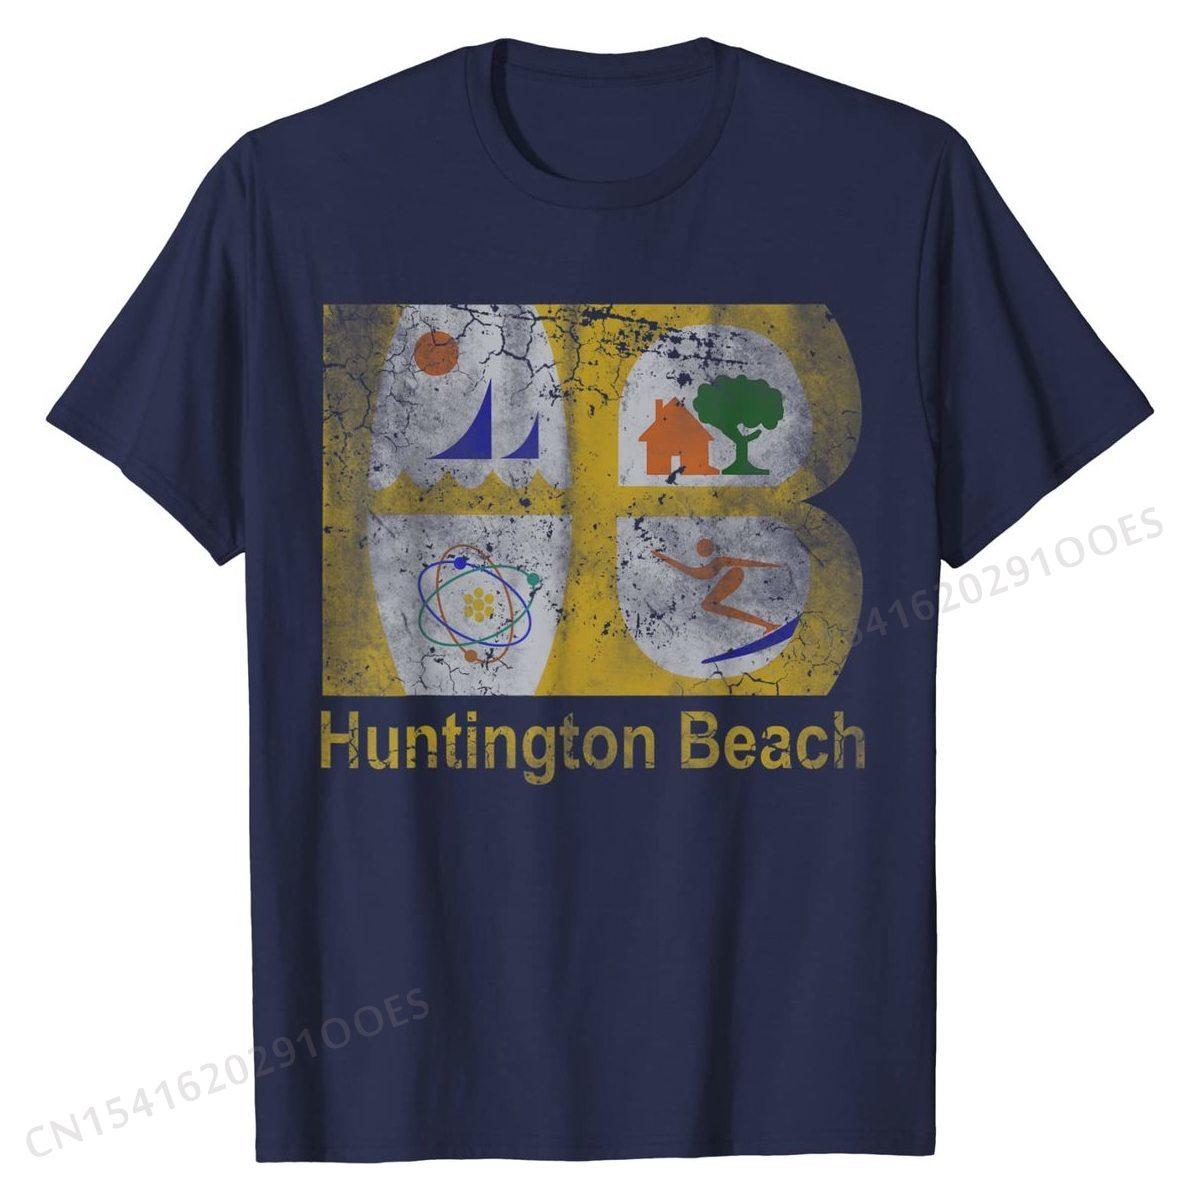 Huntington Beach bandera California Casa Amor familia camiseta vacaciones T camisa divertido...